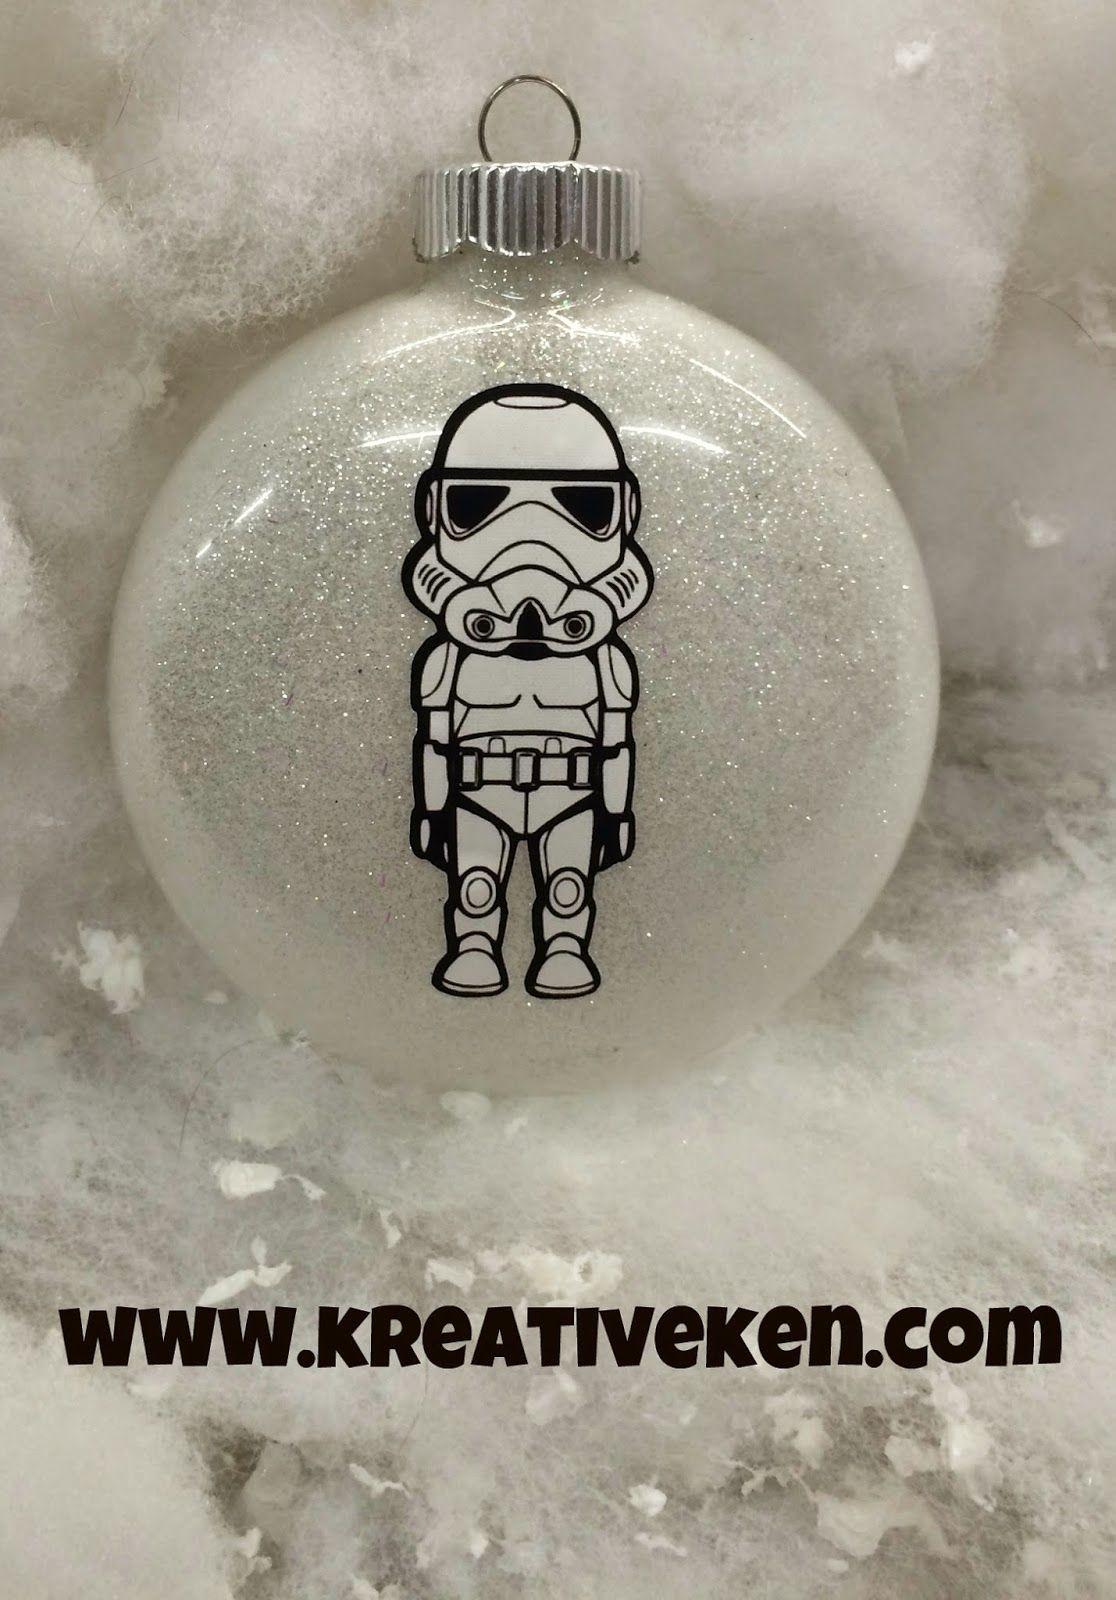 Ken S Kreations Star Wars Ornaments Star Wars Christmas Ornaments Star Wars Christmas Tree Diy Star Wars Gifts